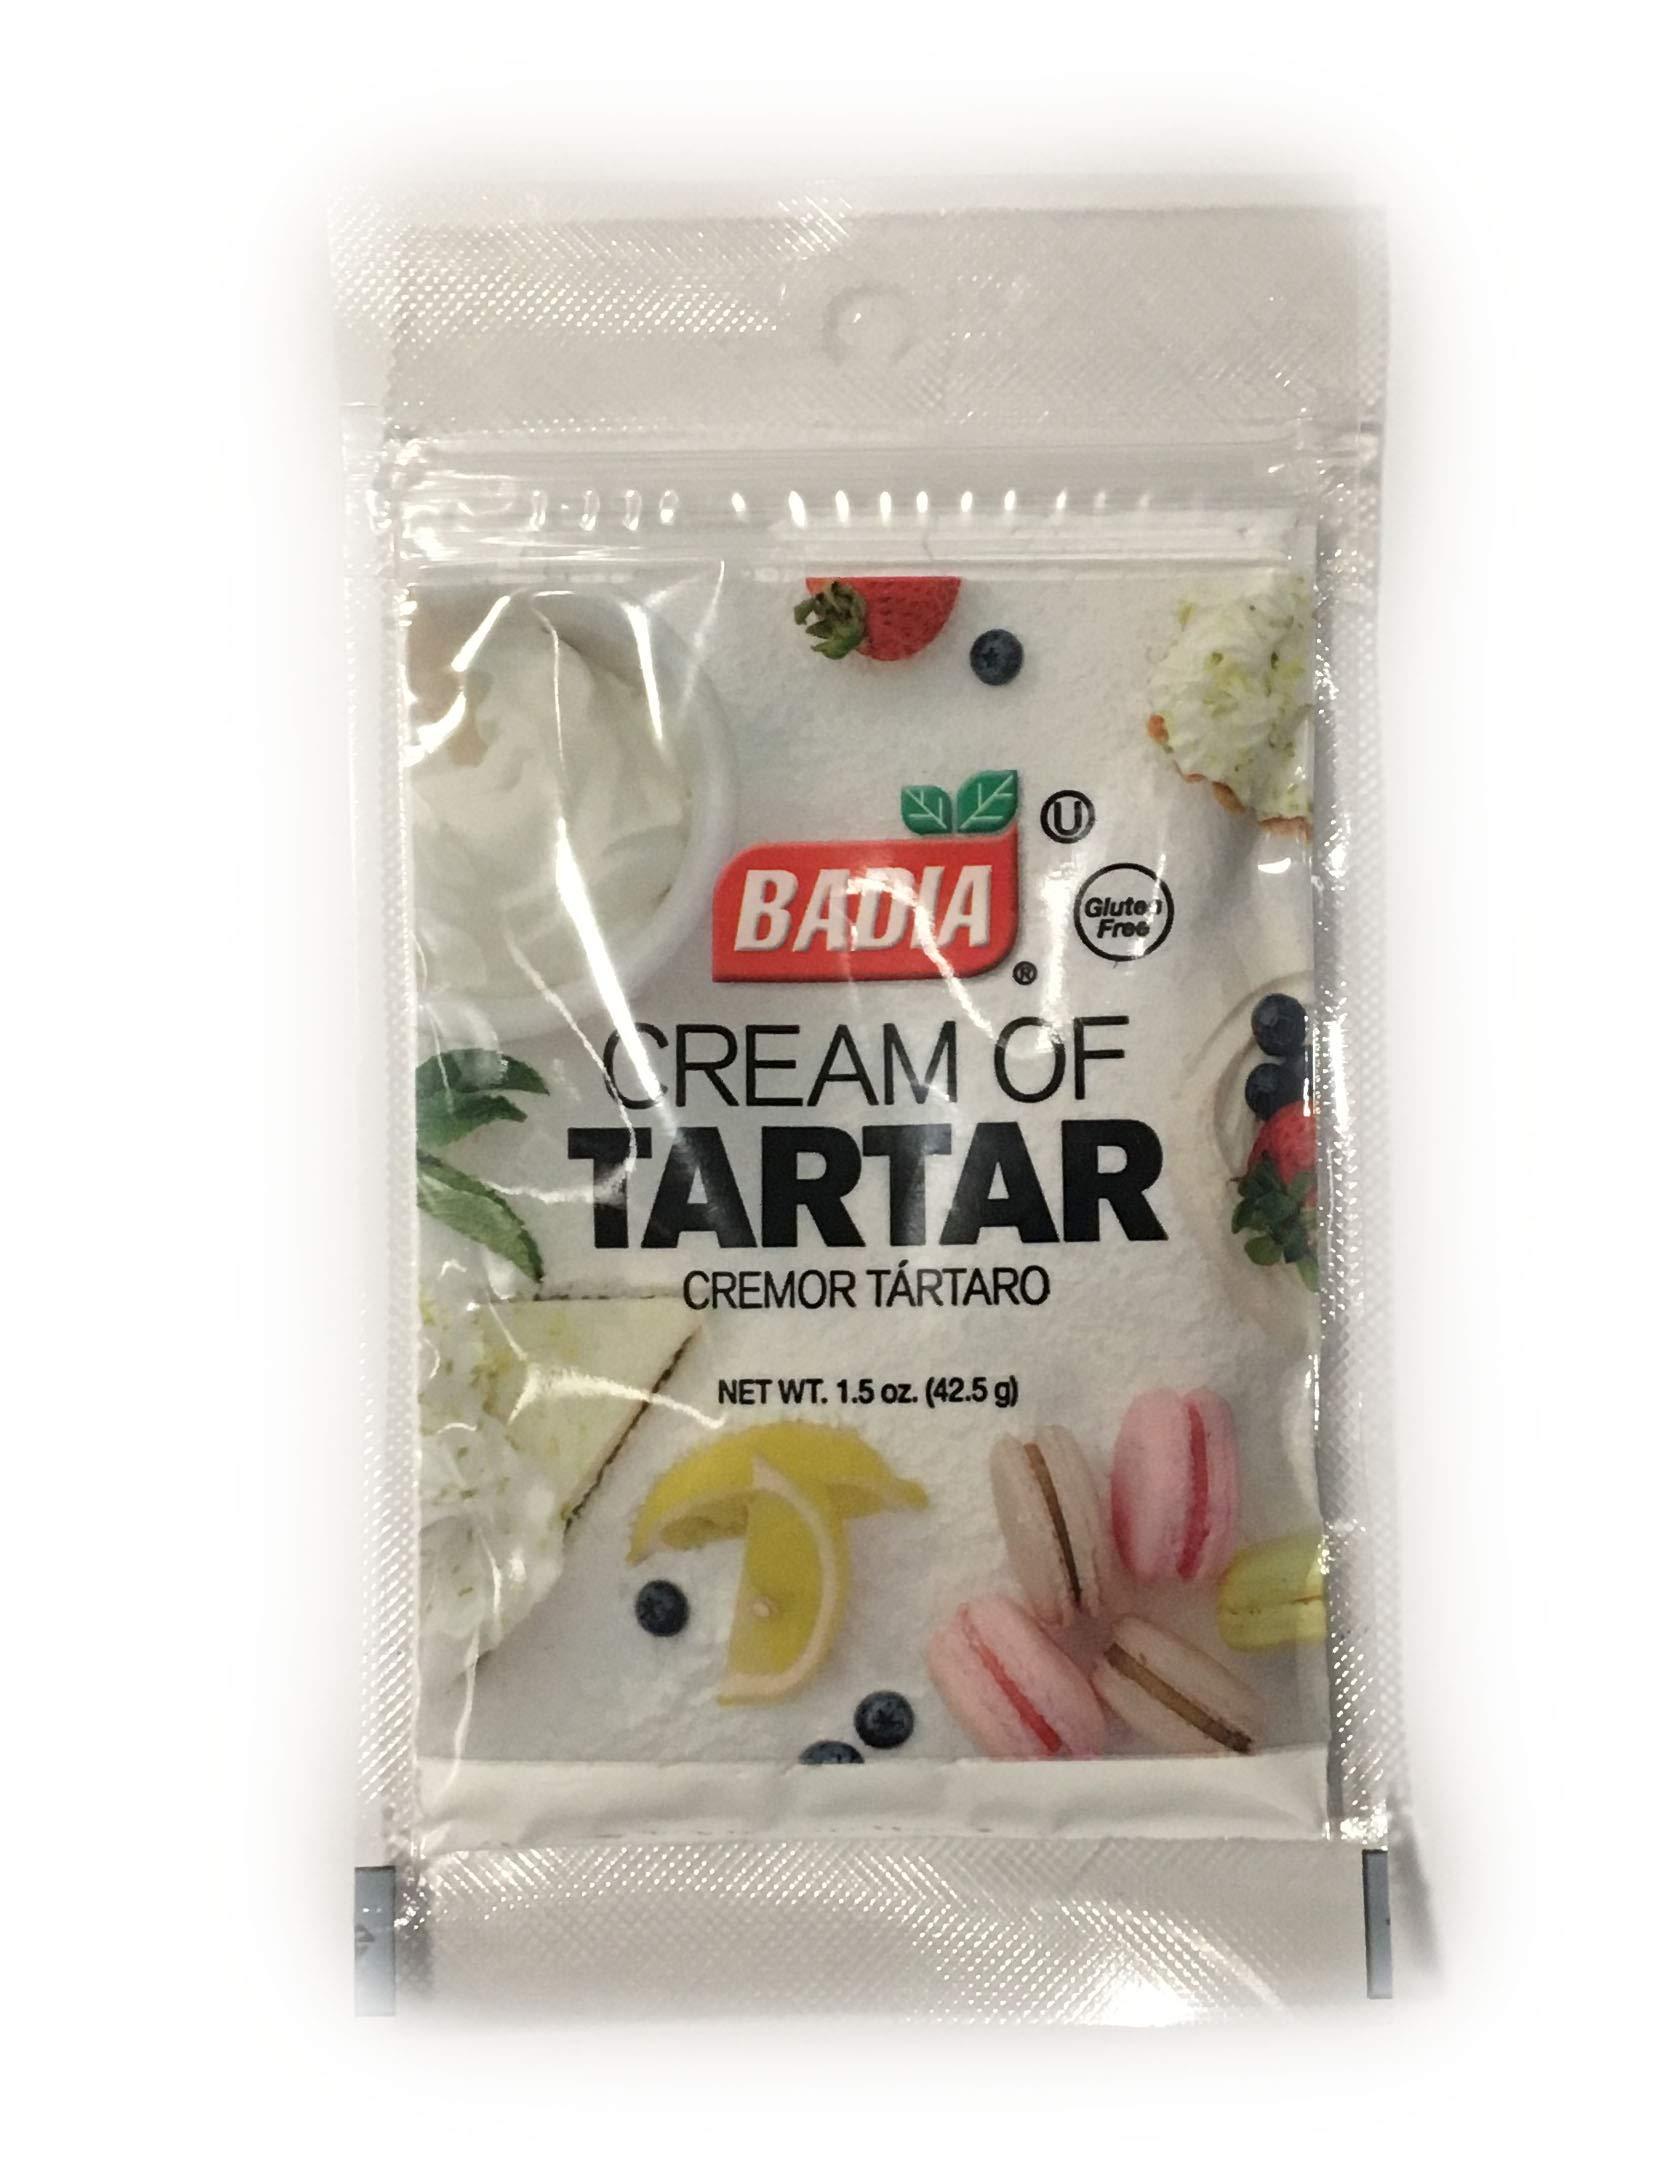 6 Pack Cream of Tartar Powder/Cremor de Tartaro Kosher 6x1.5oz EA